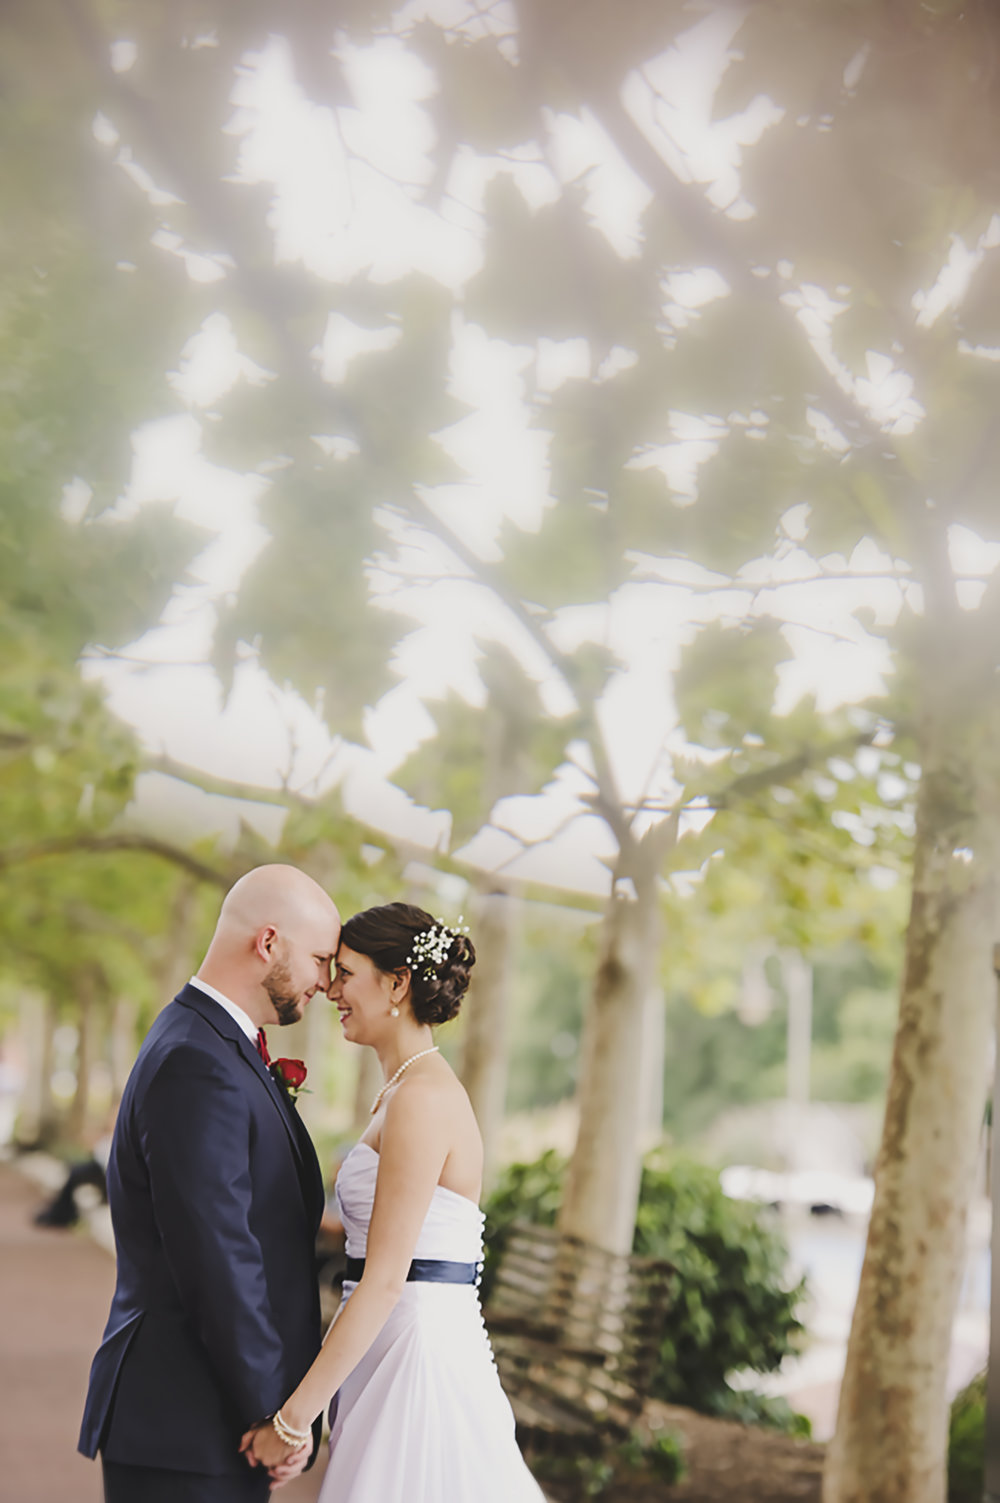 Baltimore Wedding_Summer Wedding_Navy and Red Wedding_Kelsey Lane Photography_Seattle Wedding Photographer_7